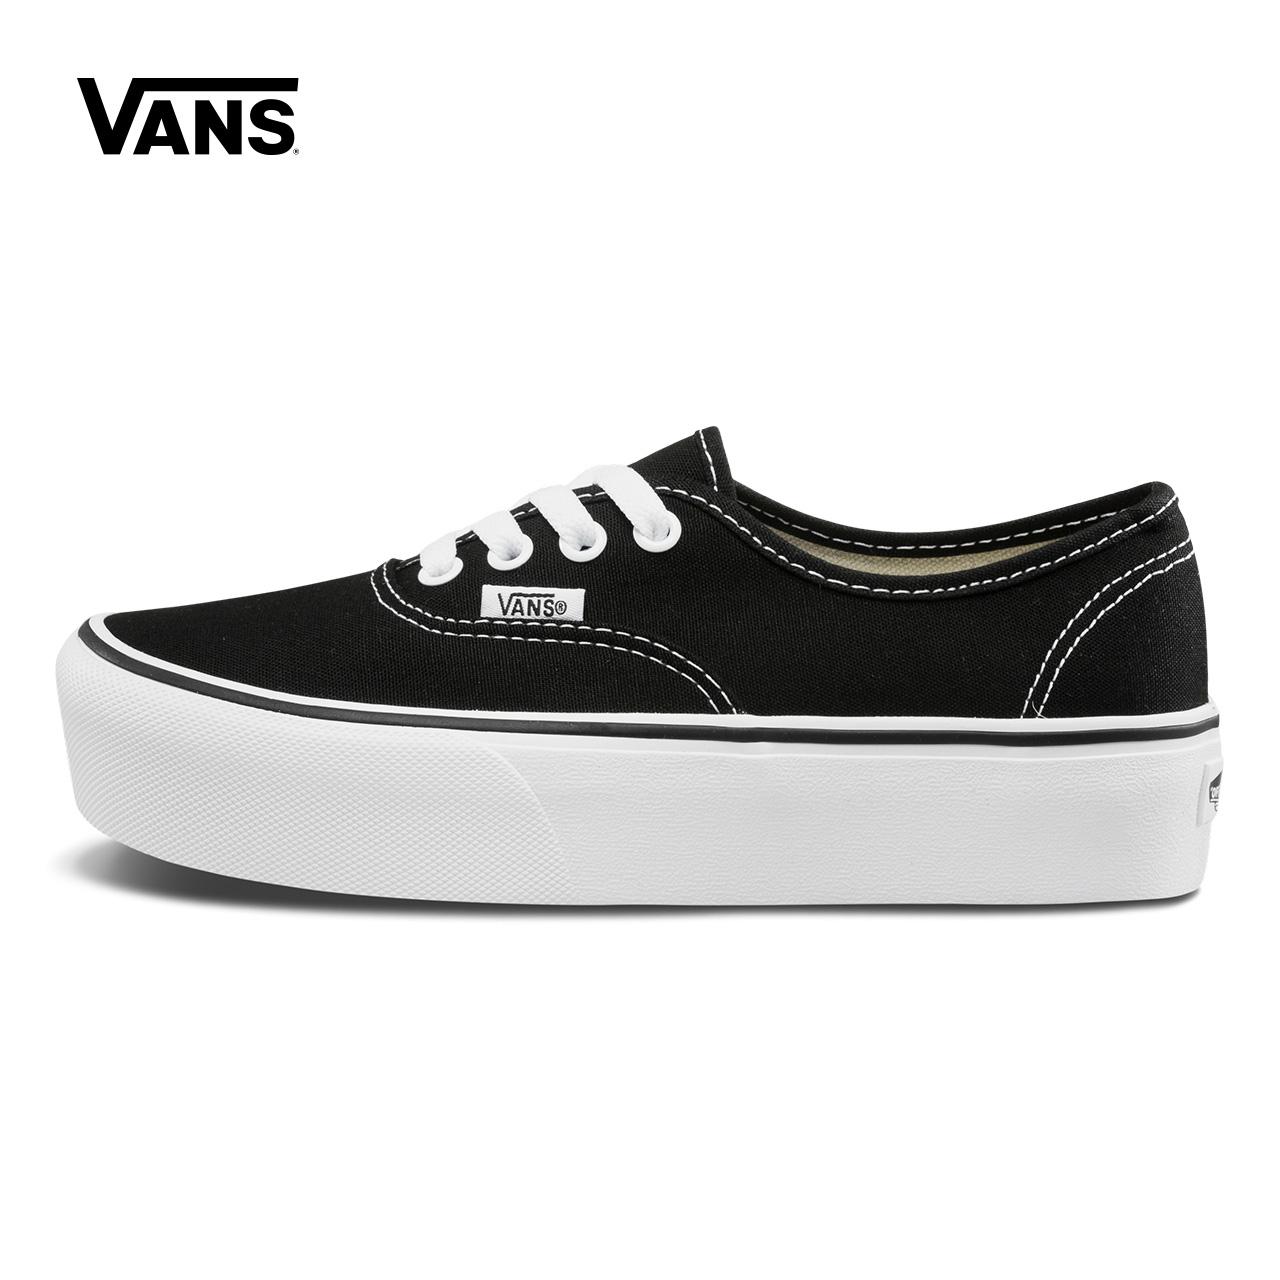 Vans 范斯官方女款AUTHENTIC板鞋|VN0A3AV8BLK